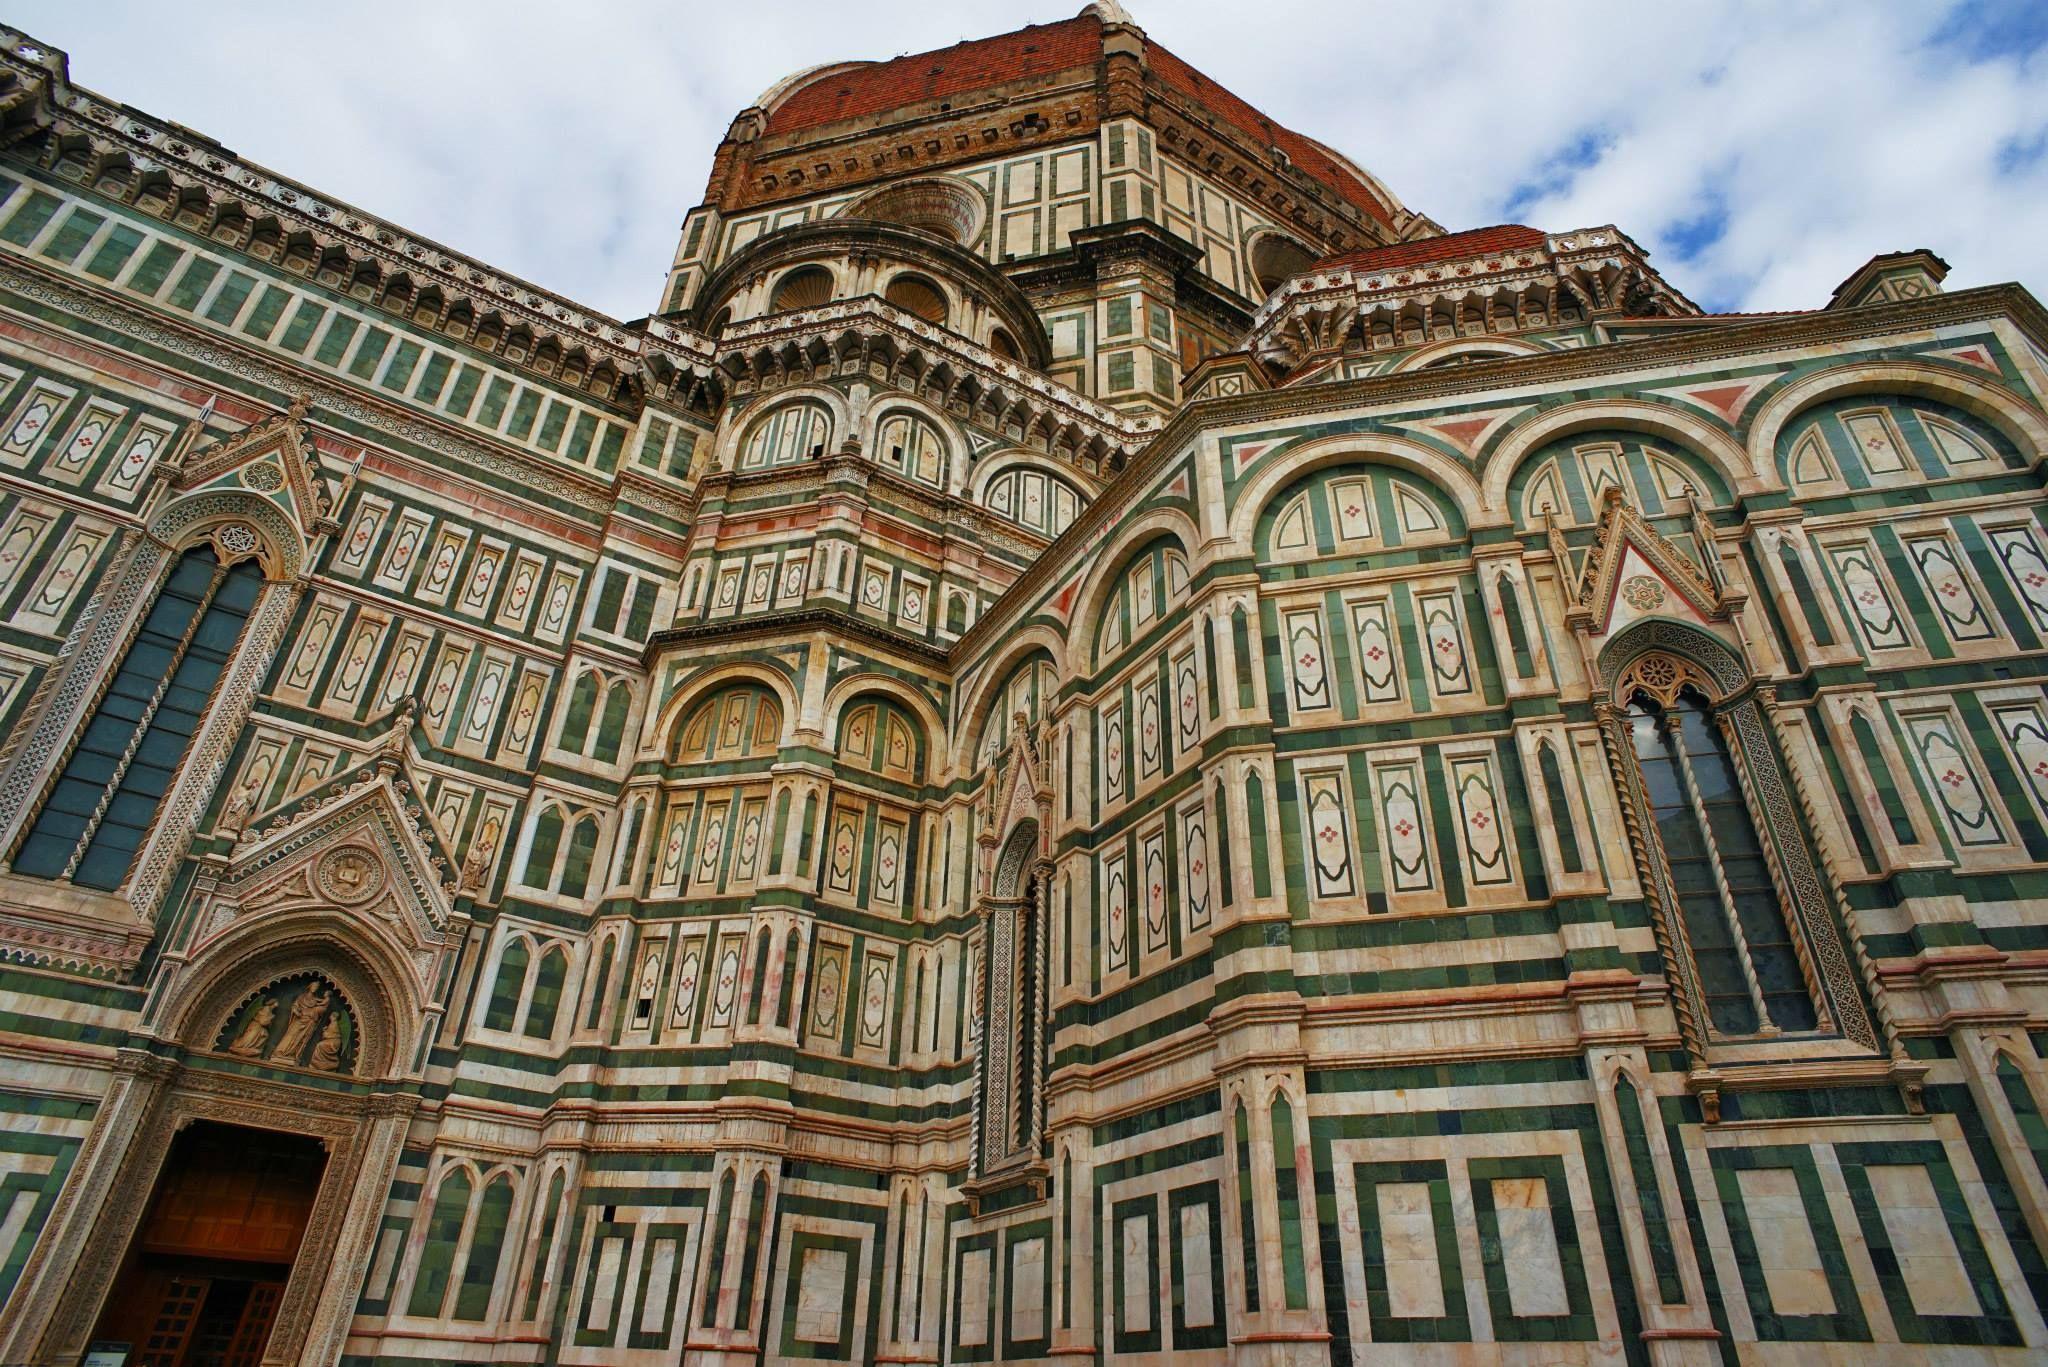 Florencia, Italy